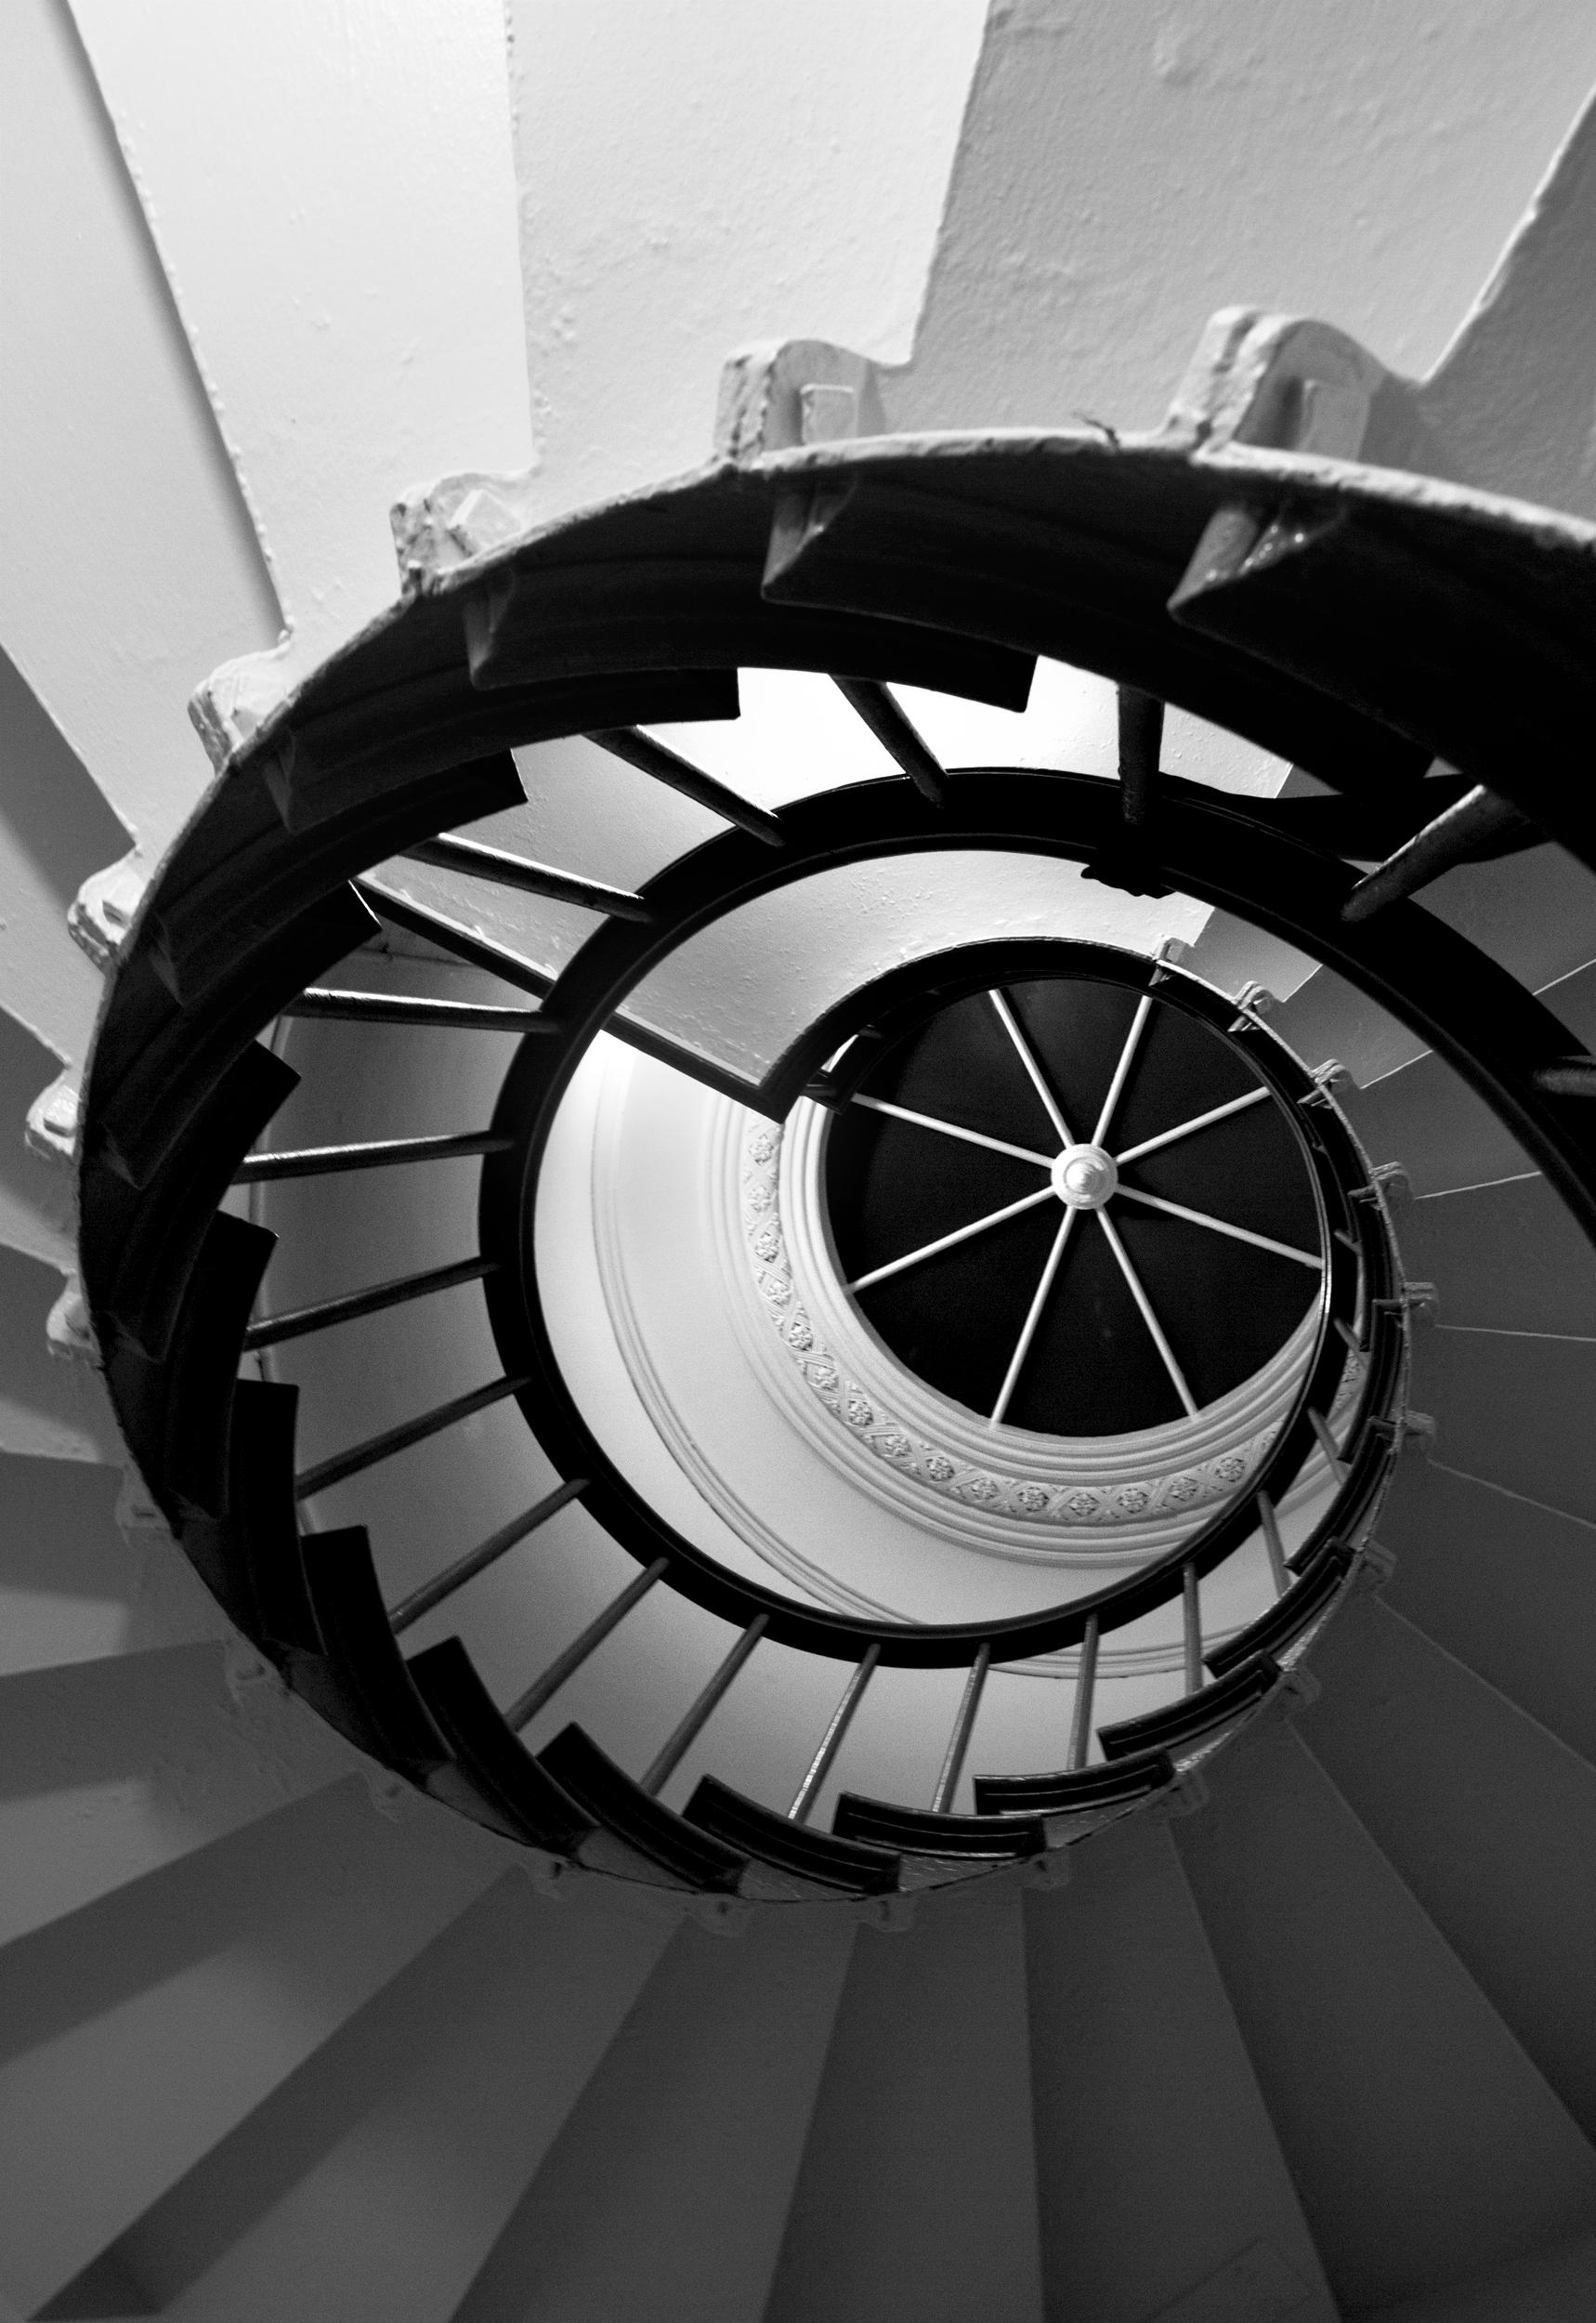 Wolens_AllYears_Architecture_BW_3.jpg